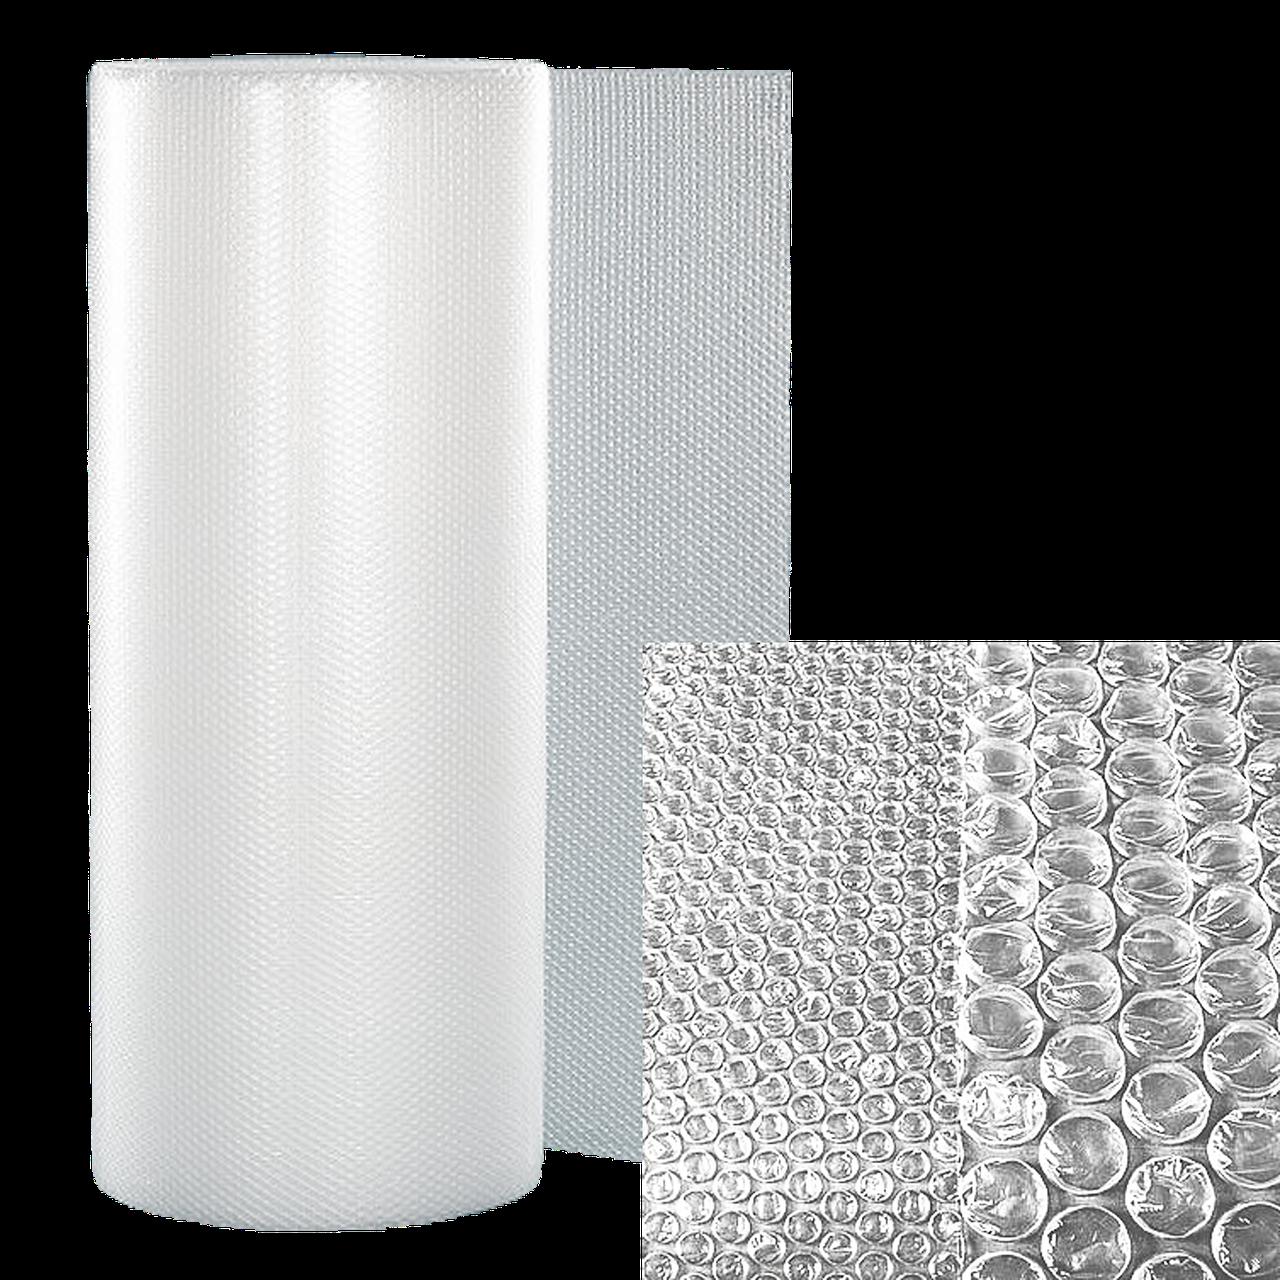 Воздушно-пузырчатая пленка МПО-Д45, ширина 1,5 м (рулон 100м), диаметр пузырька 10 мм.